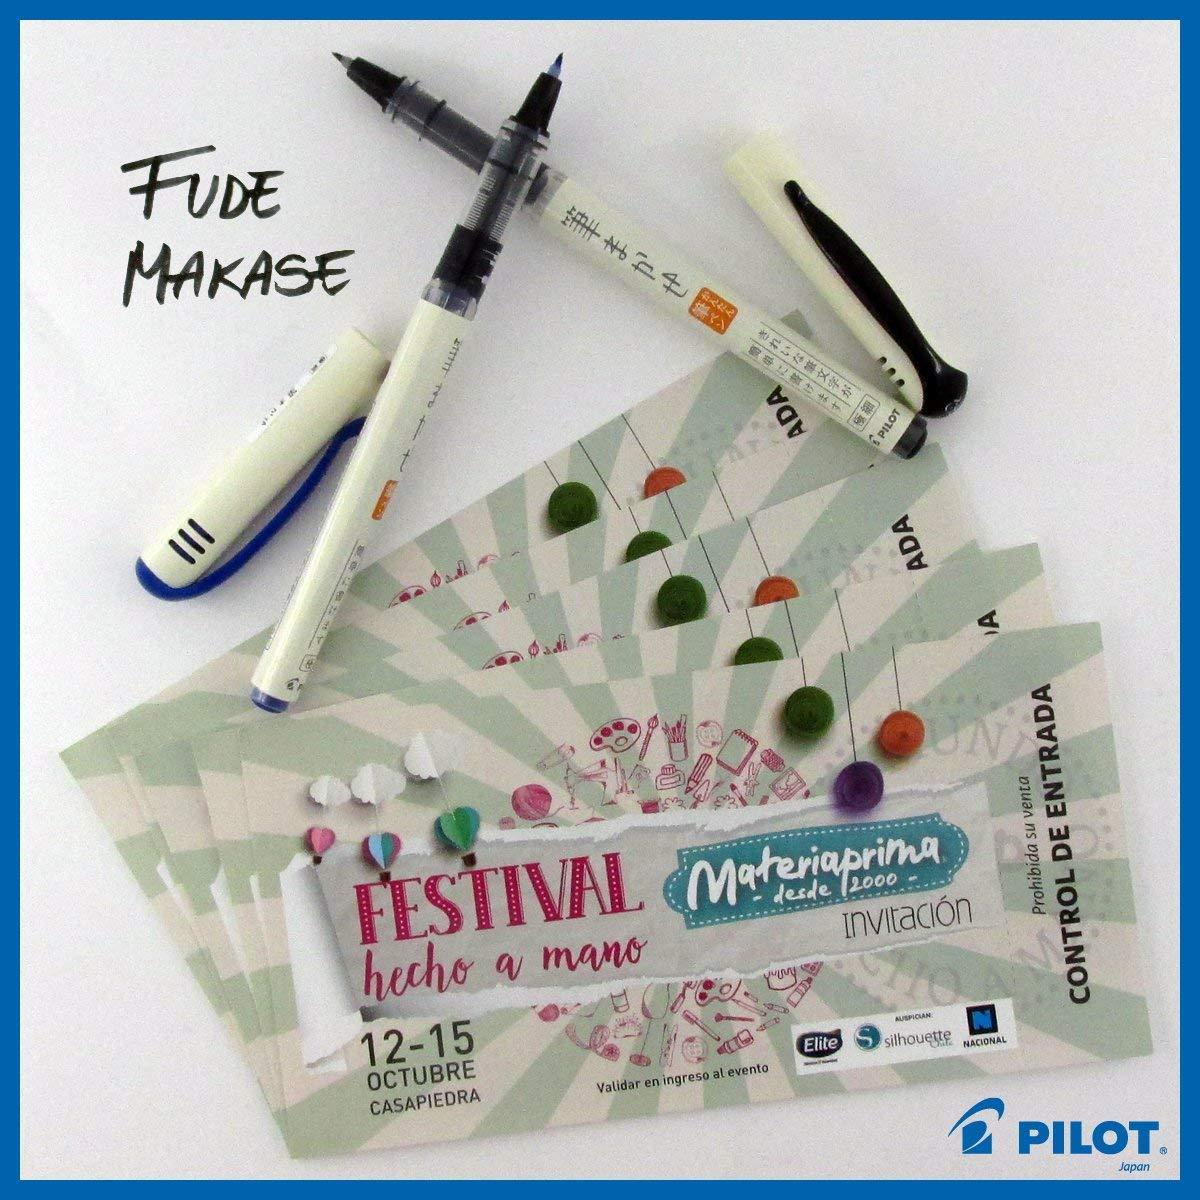 Pilot Fude Makase Color Brush Pen, 8 color (Black, Red, Orange, Blue, Blue Black, Green, Pink, Sepia) each 1 piece. with Original Case by Pilot Fude Makase